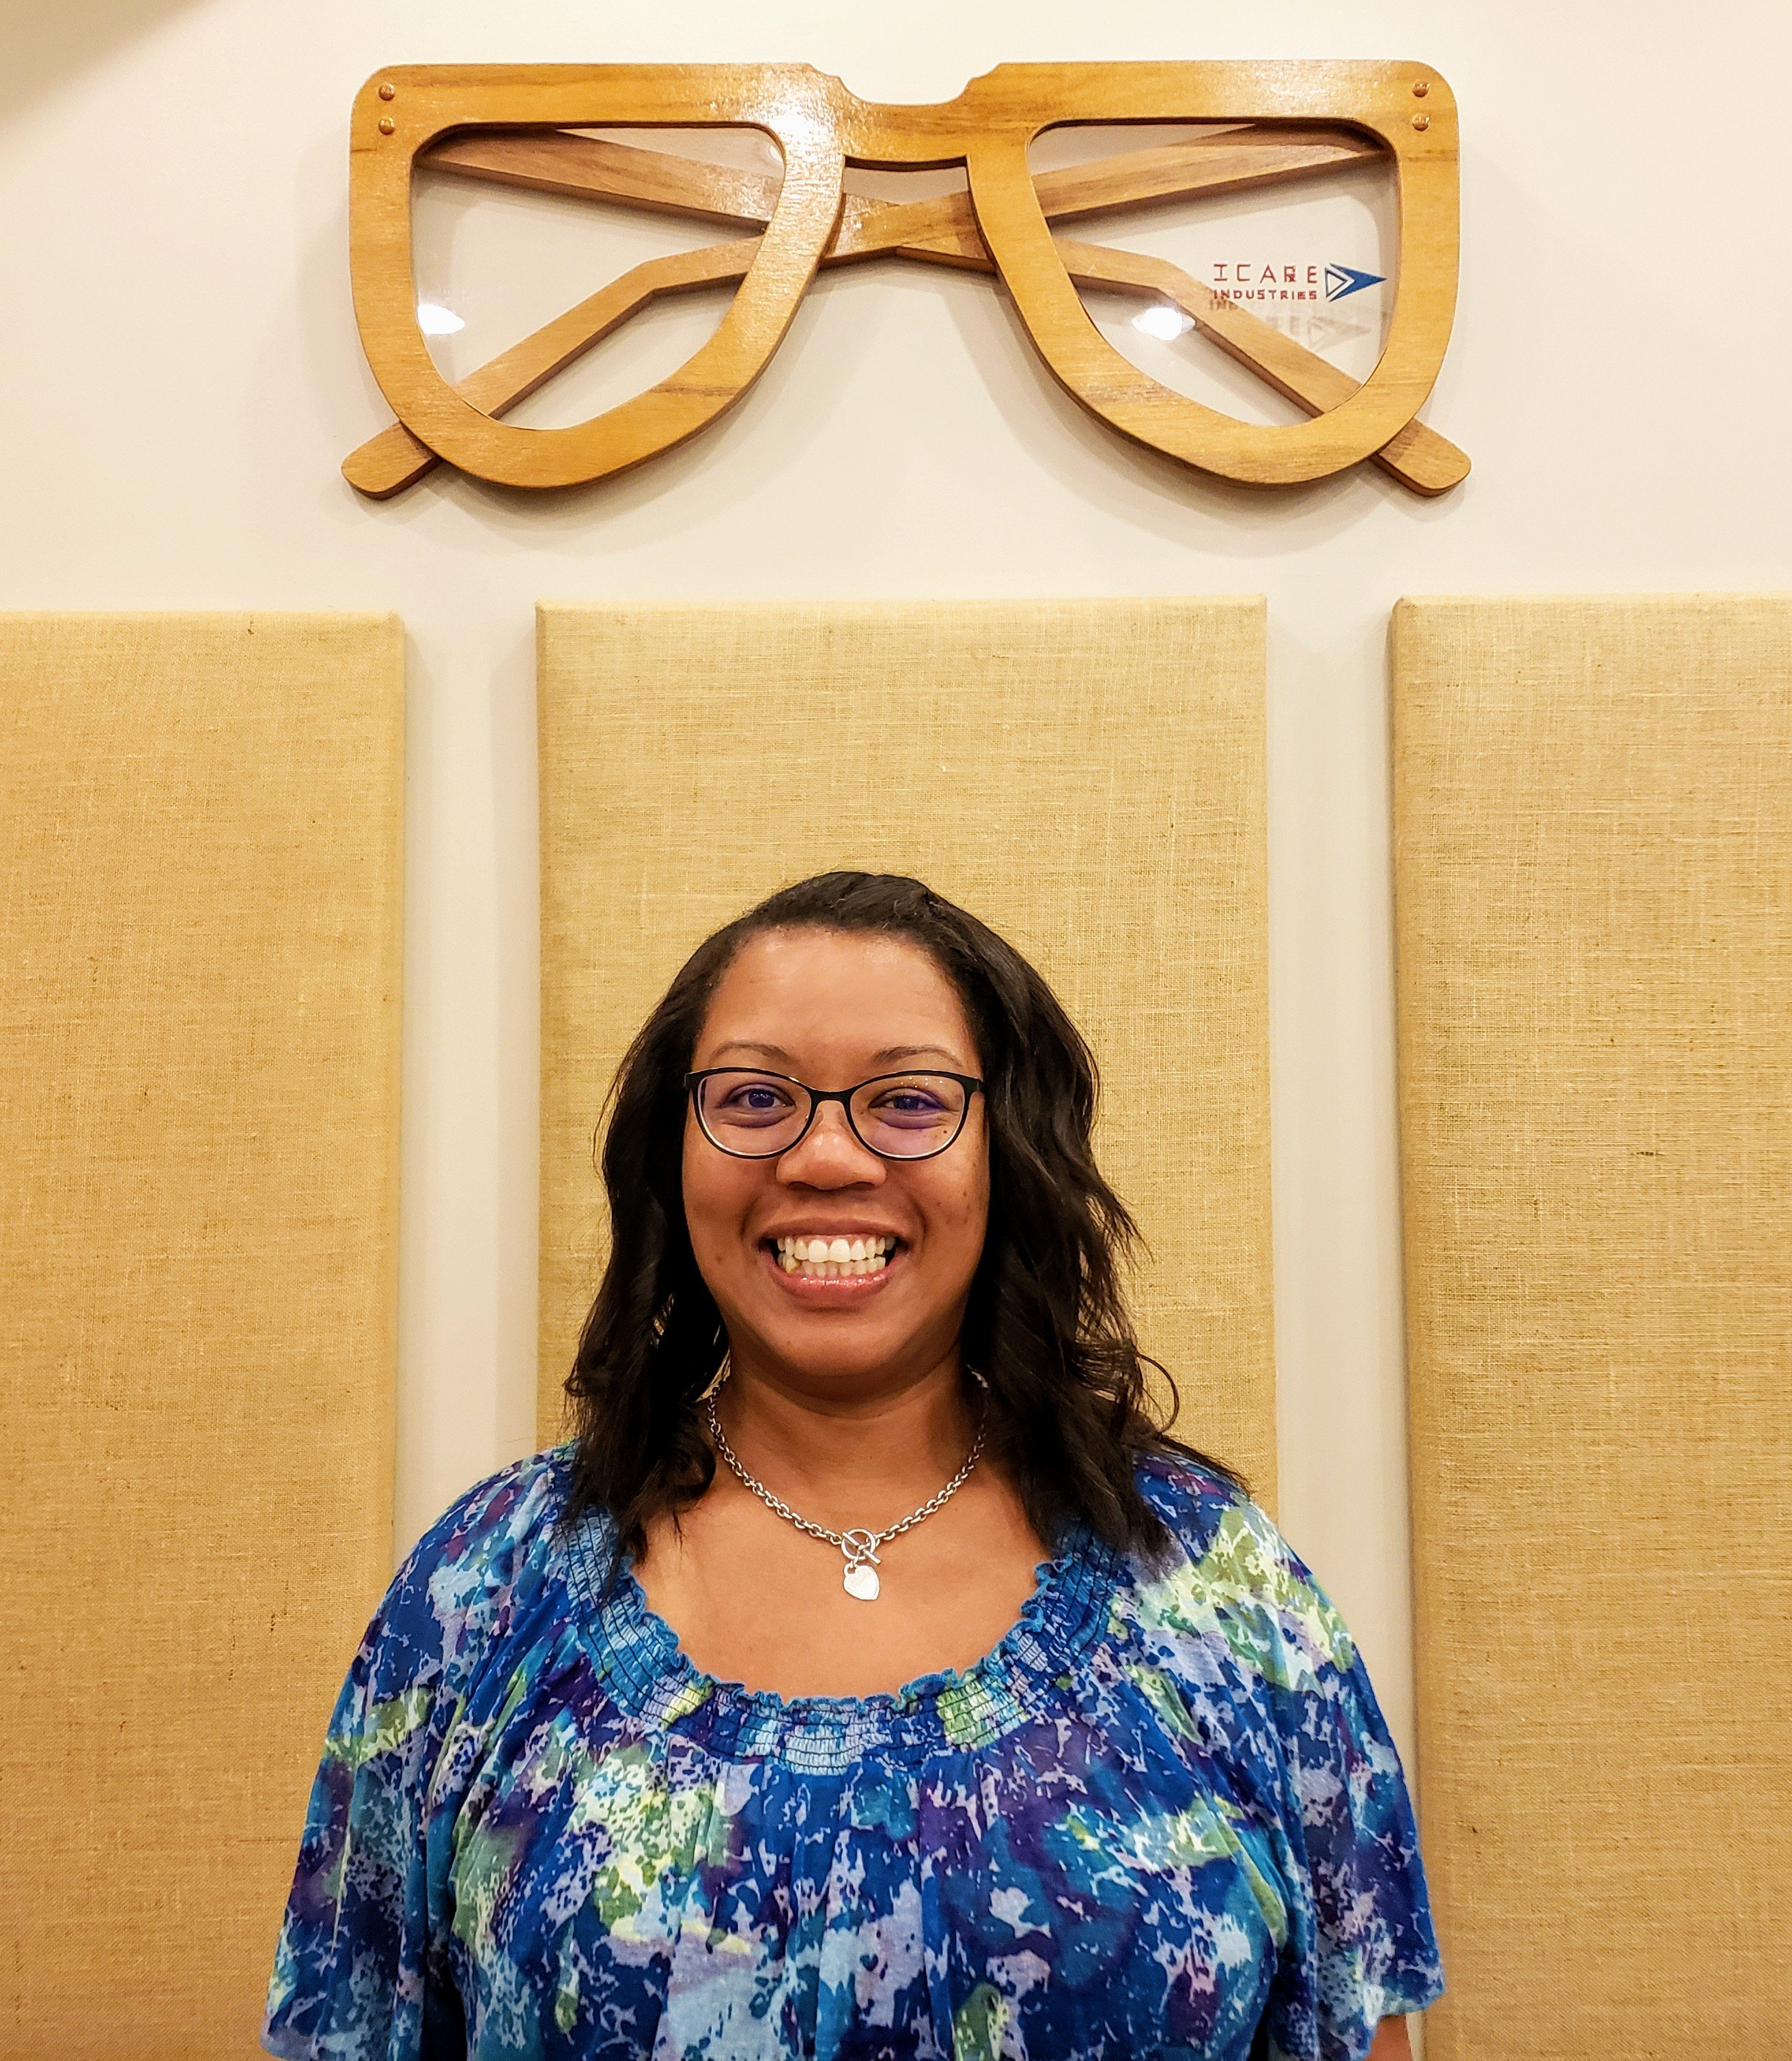 Camille IcareLabs Customer Service Cooridinator